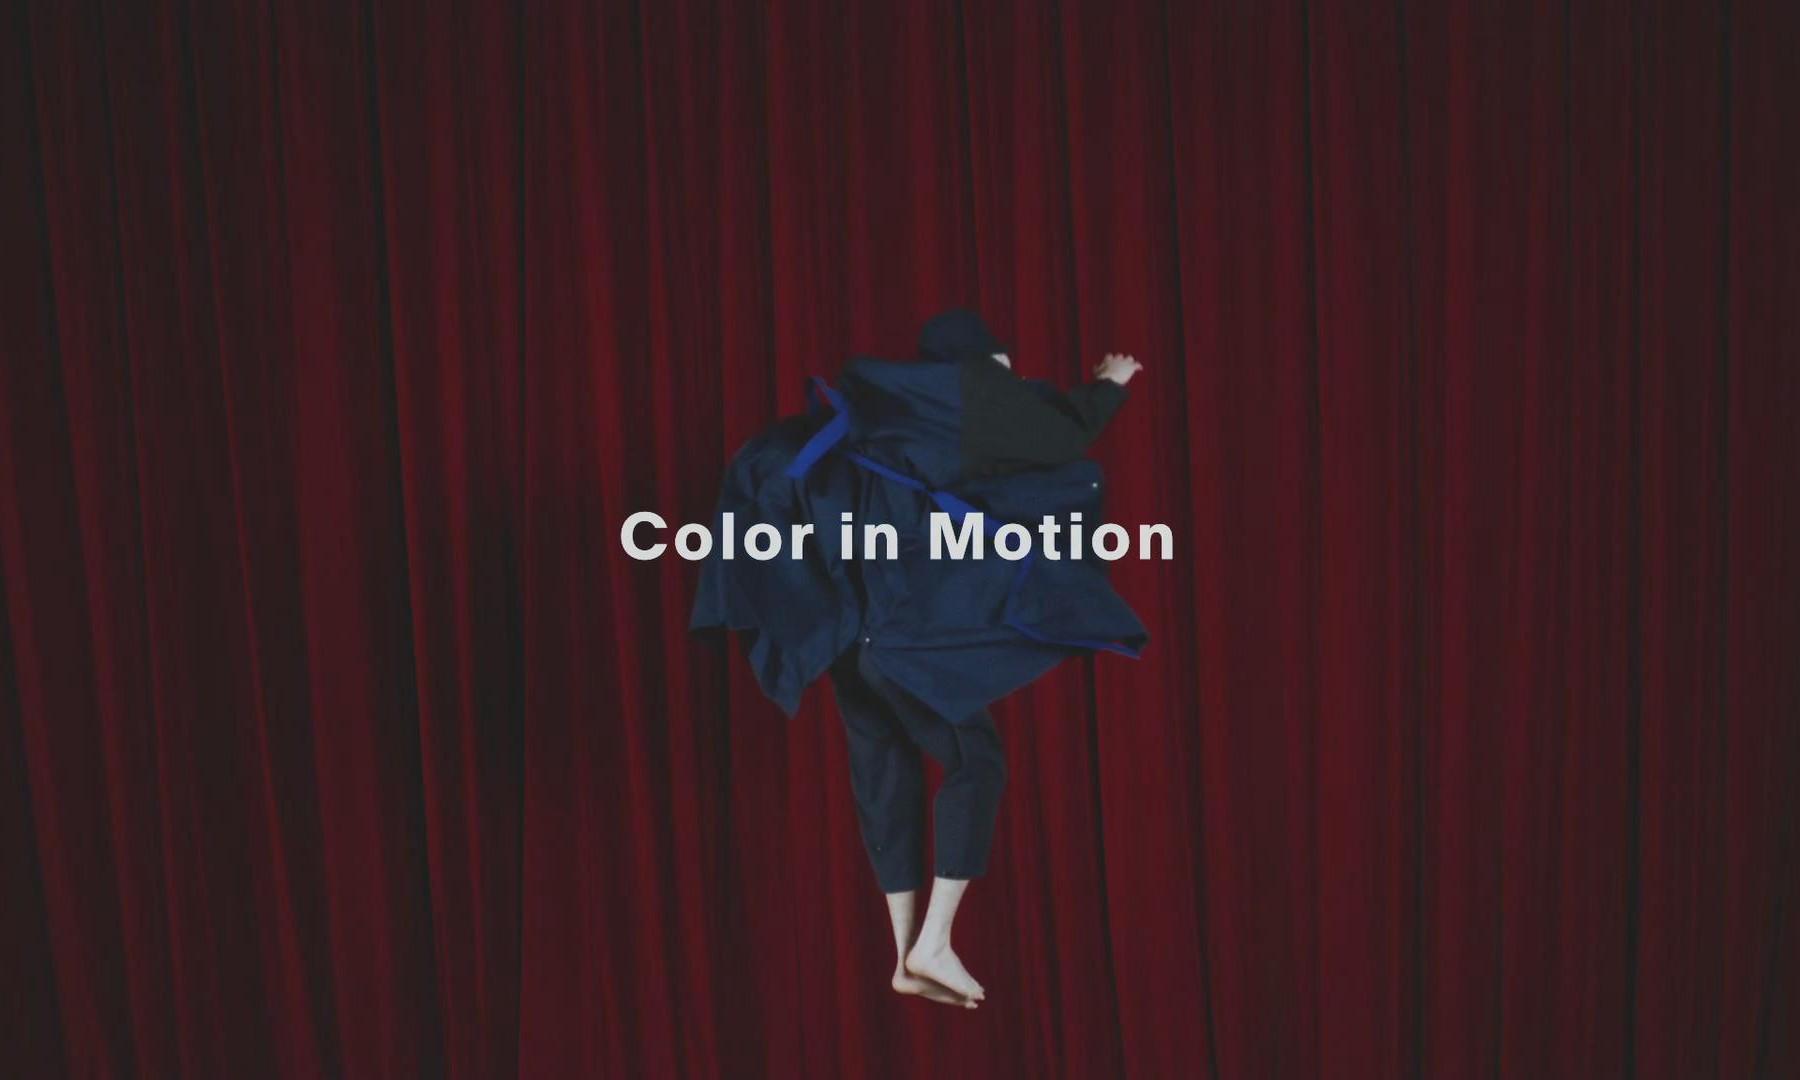 舞动的色彩,SSENSE 带来 《Color in Motion》 创意造型 Lookbook